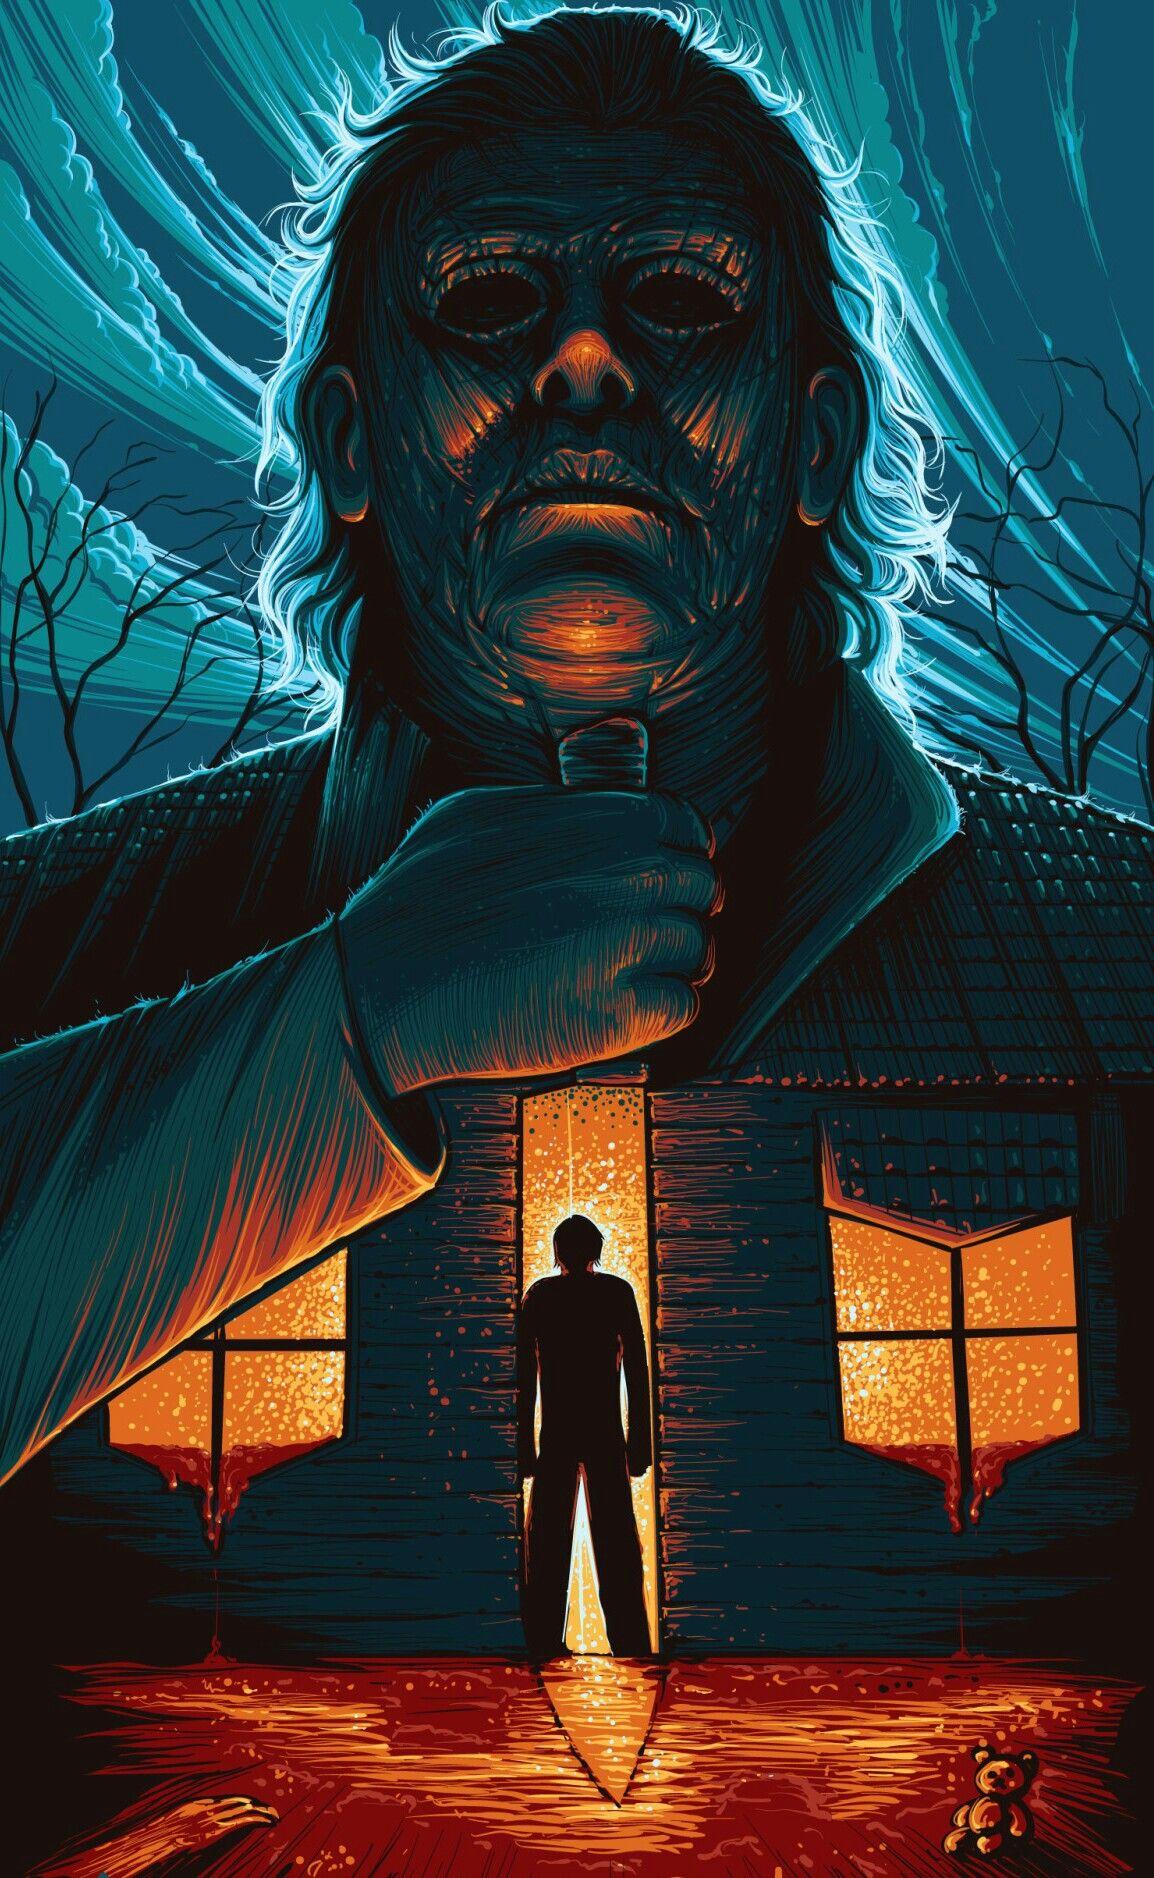 HALLOWEEN 'THE BOOGEY MAN' in 2020 Halloween movie